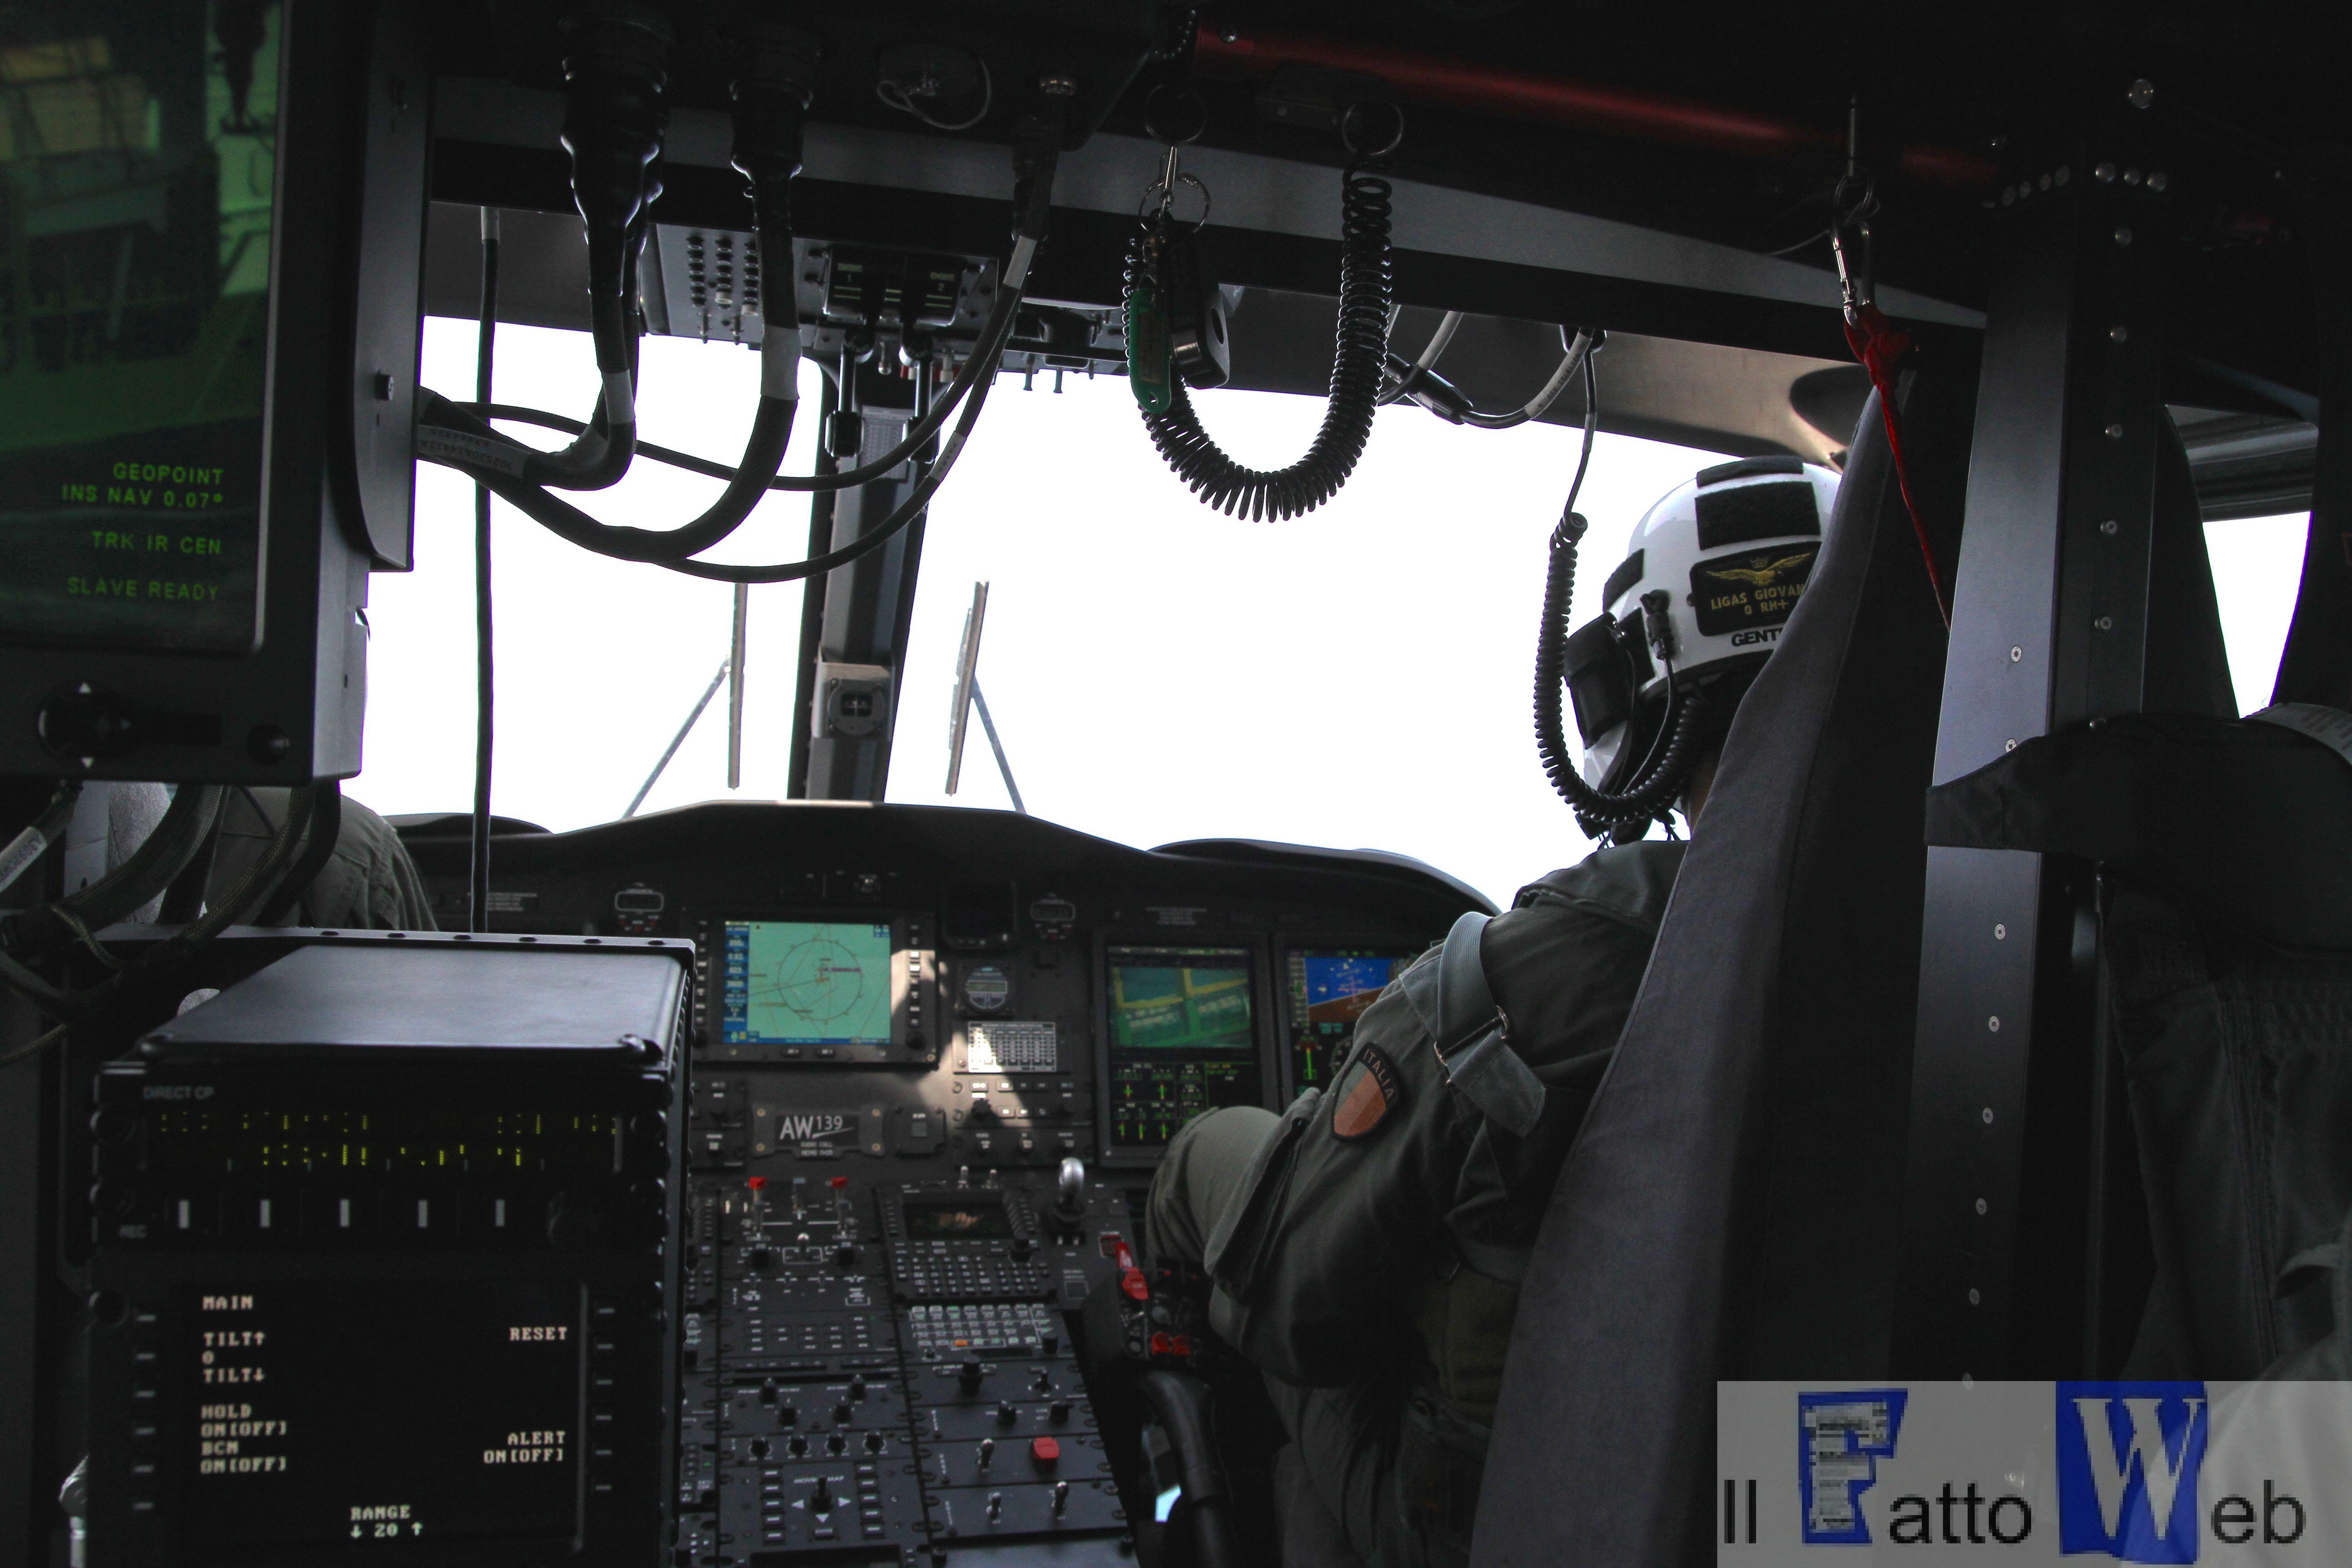 Guardia Costiera : evacuazioni mediche d'urgenza effettuate dal 2º Nucleo Aereo di Catania